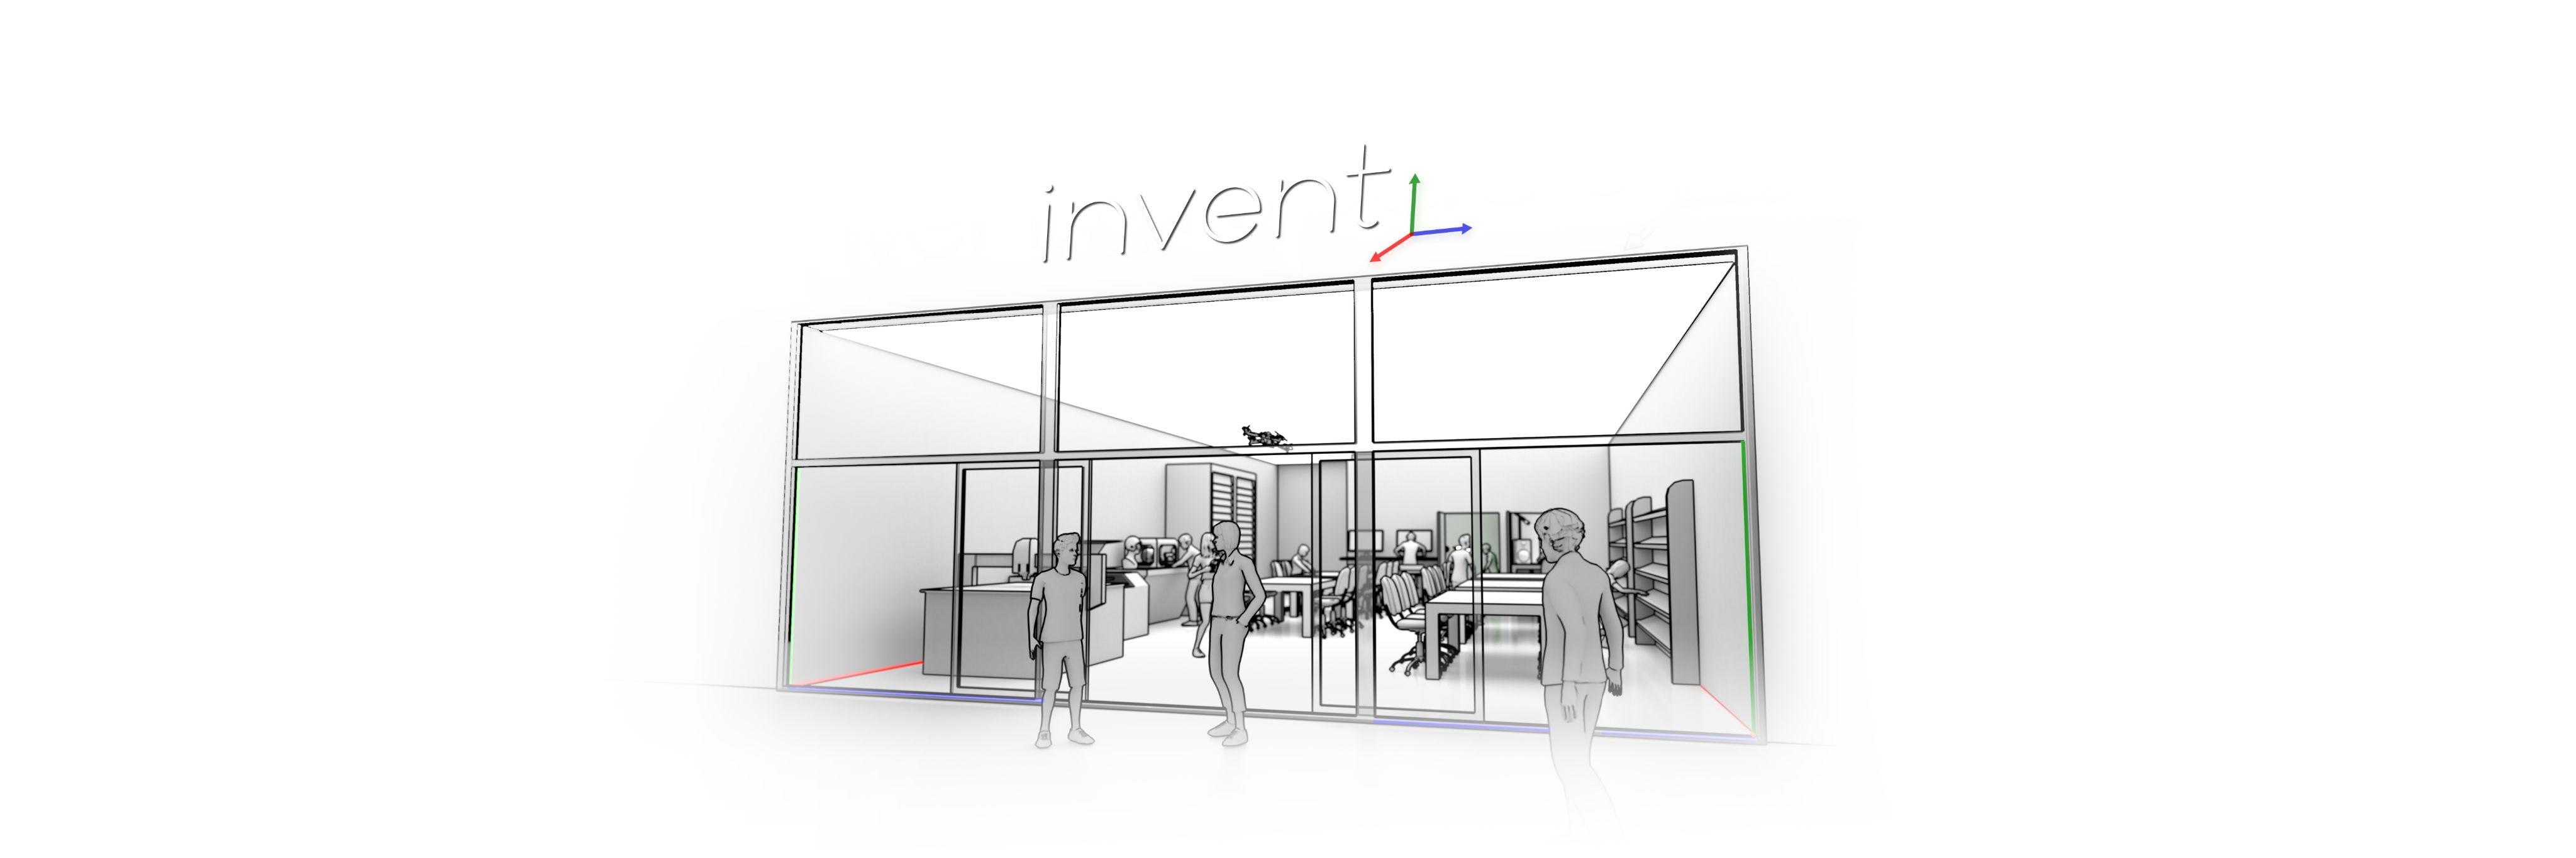 inventXYZ space entrance banner.png